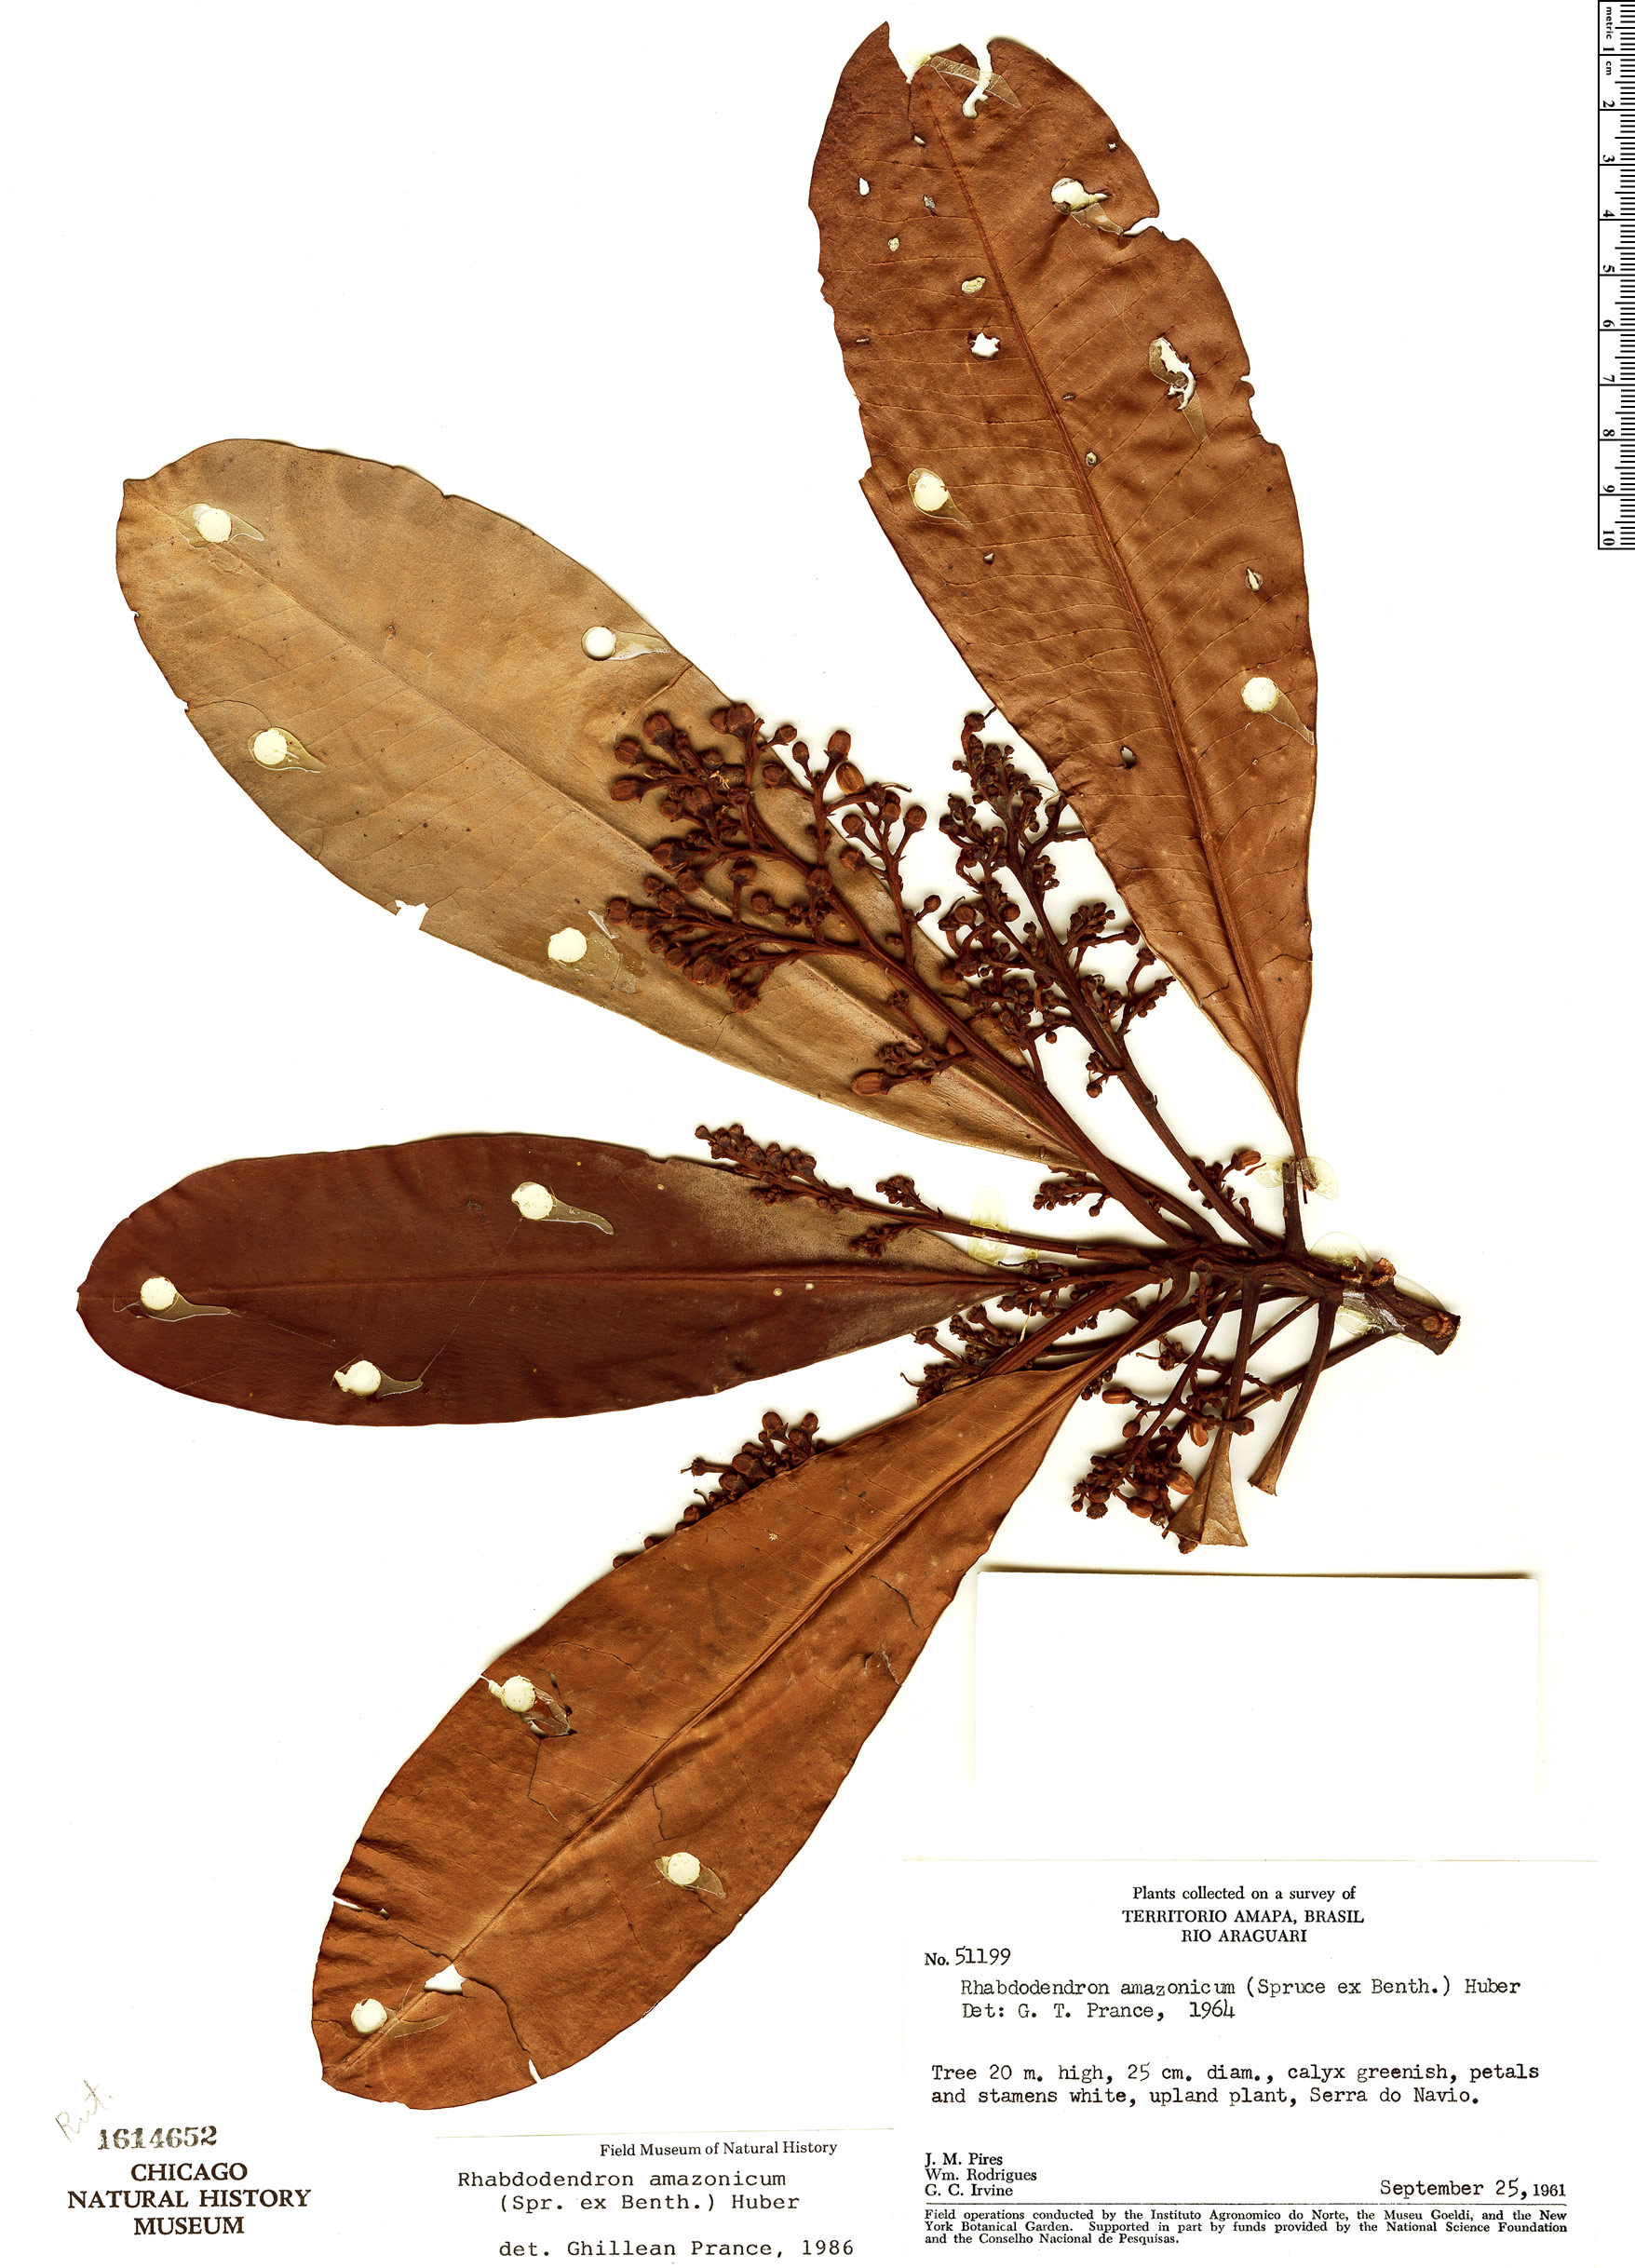 Specimen: Rhabdodendron amazonicum